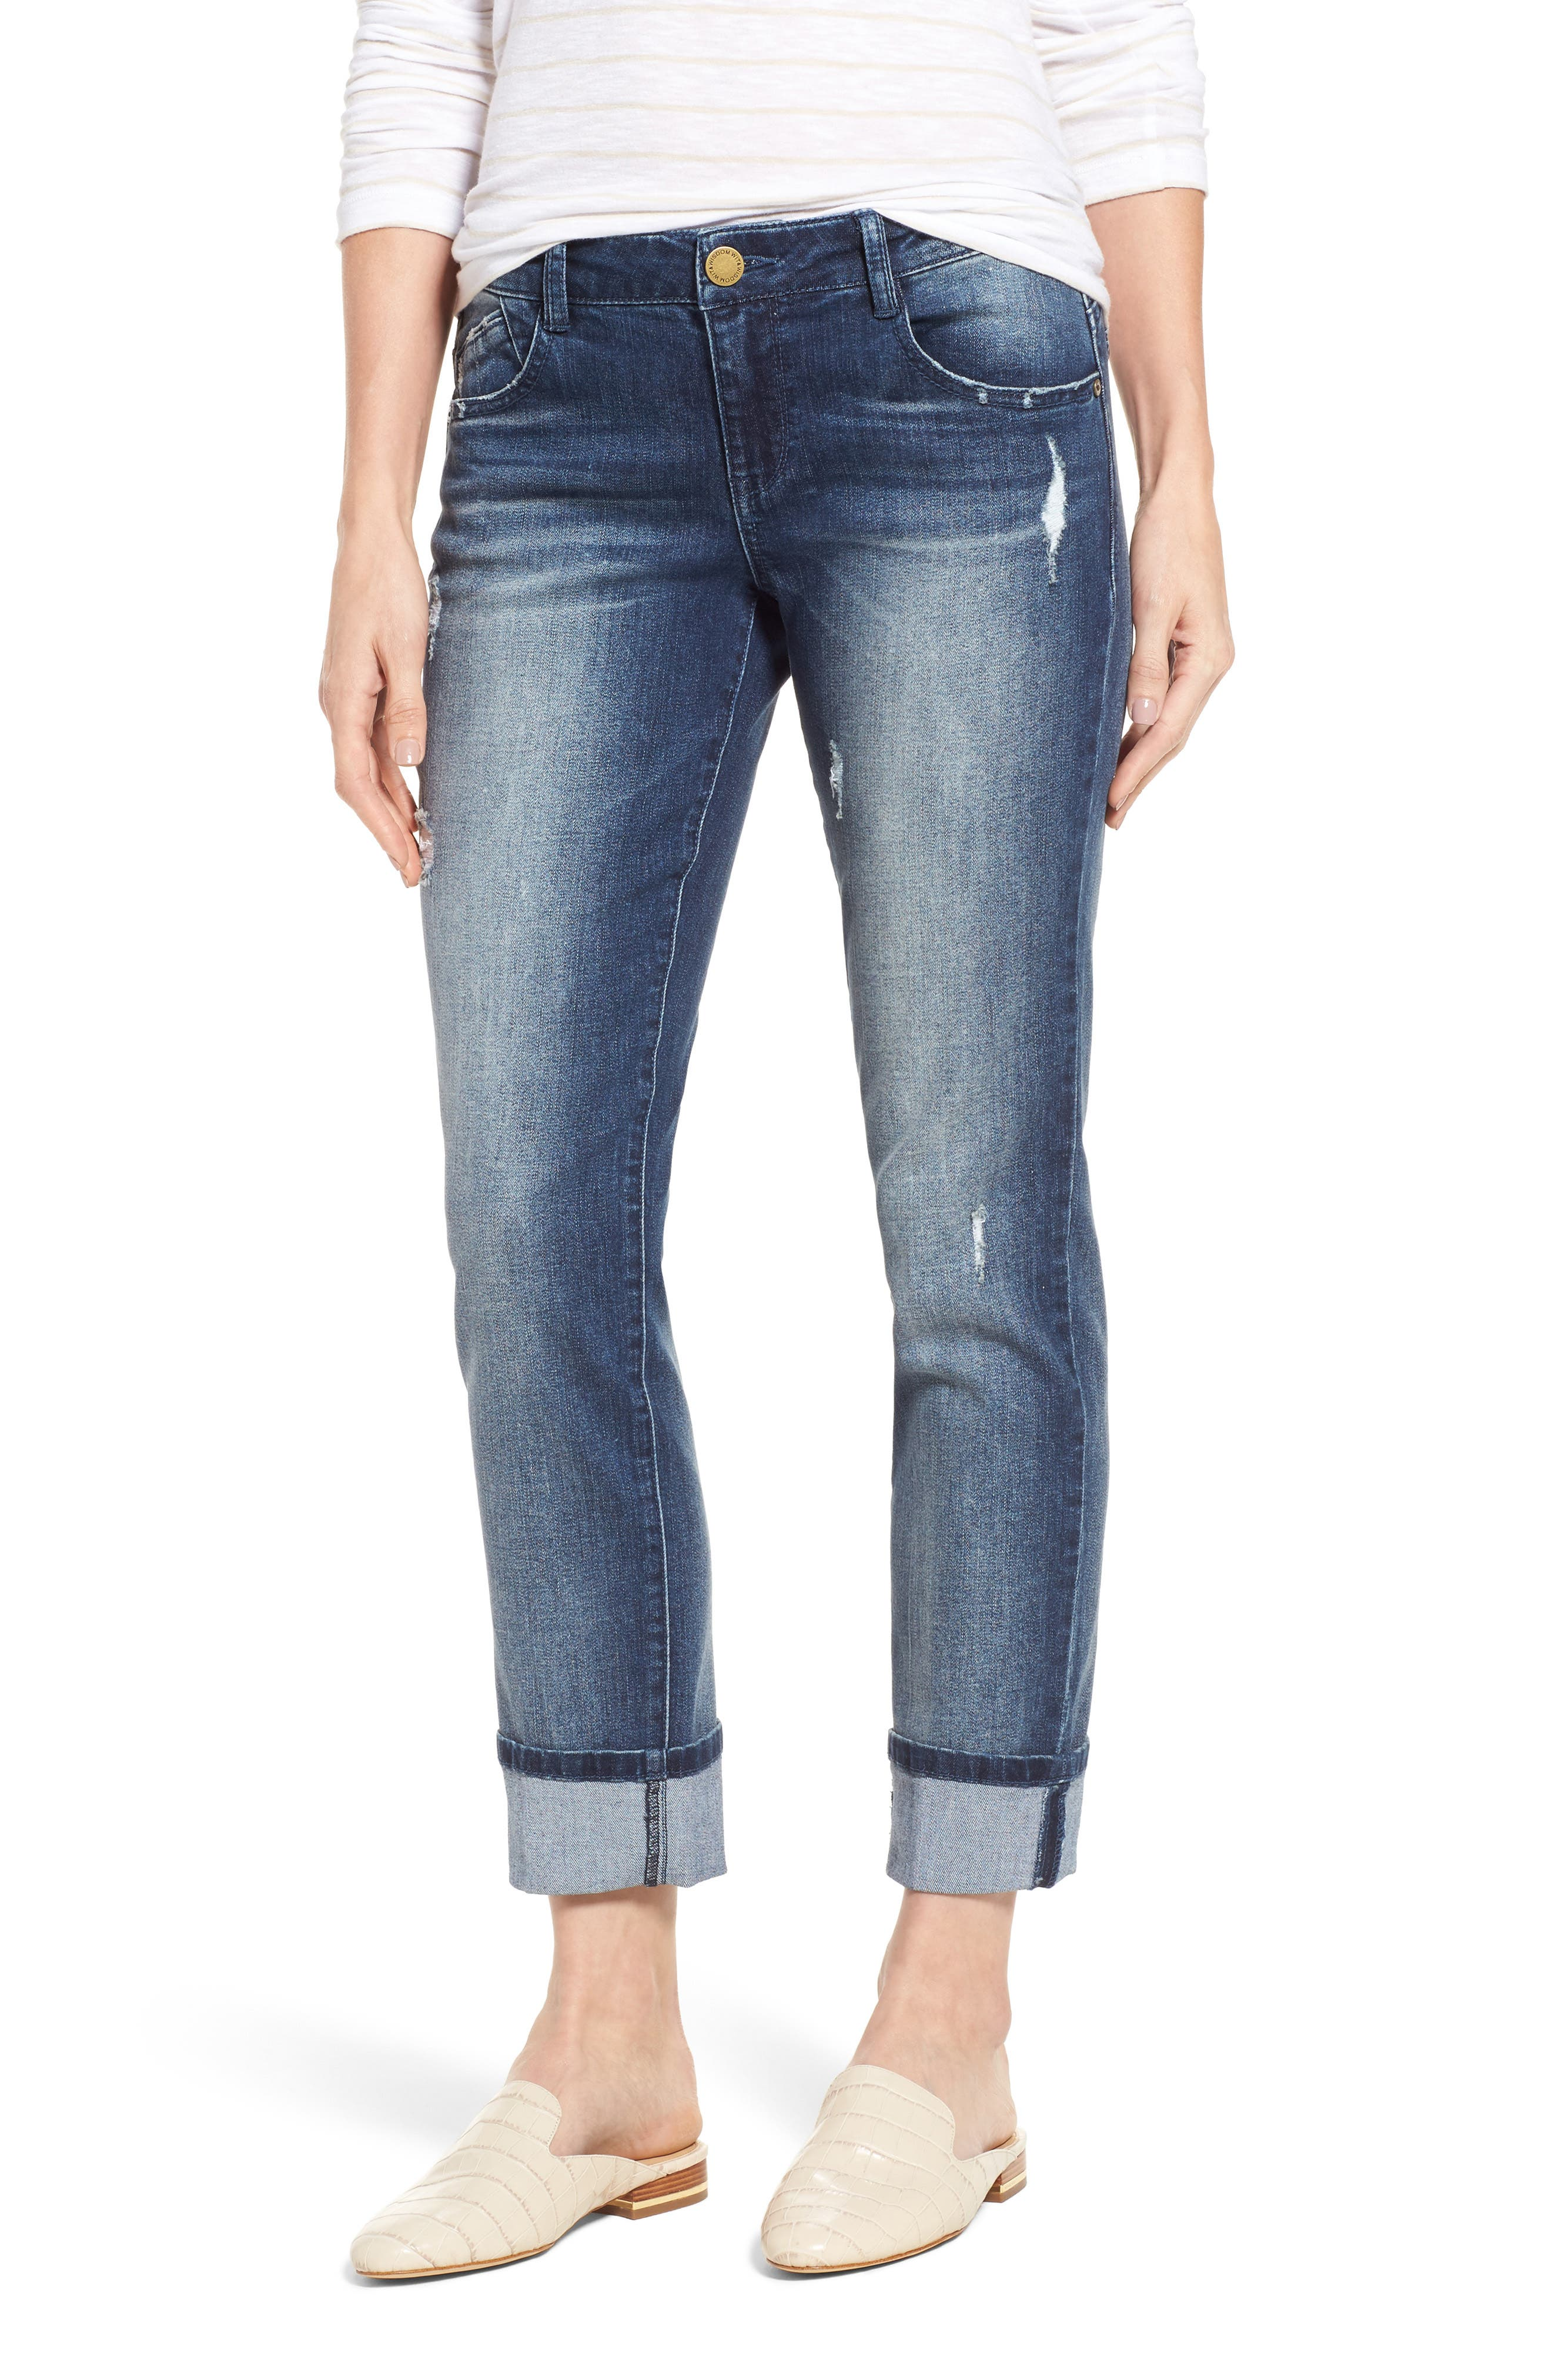 WIT & WISDOM Flex-ellent Ripped Boyfriend Jeans